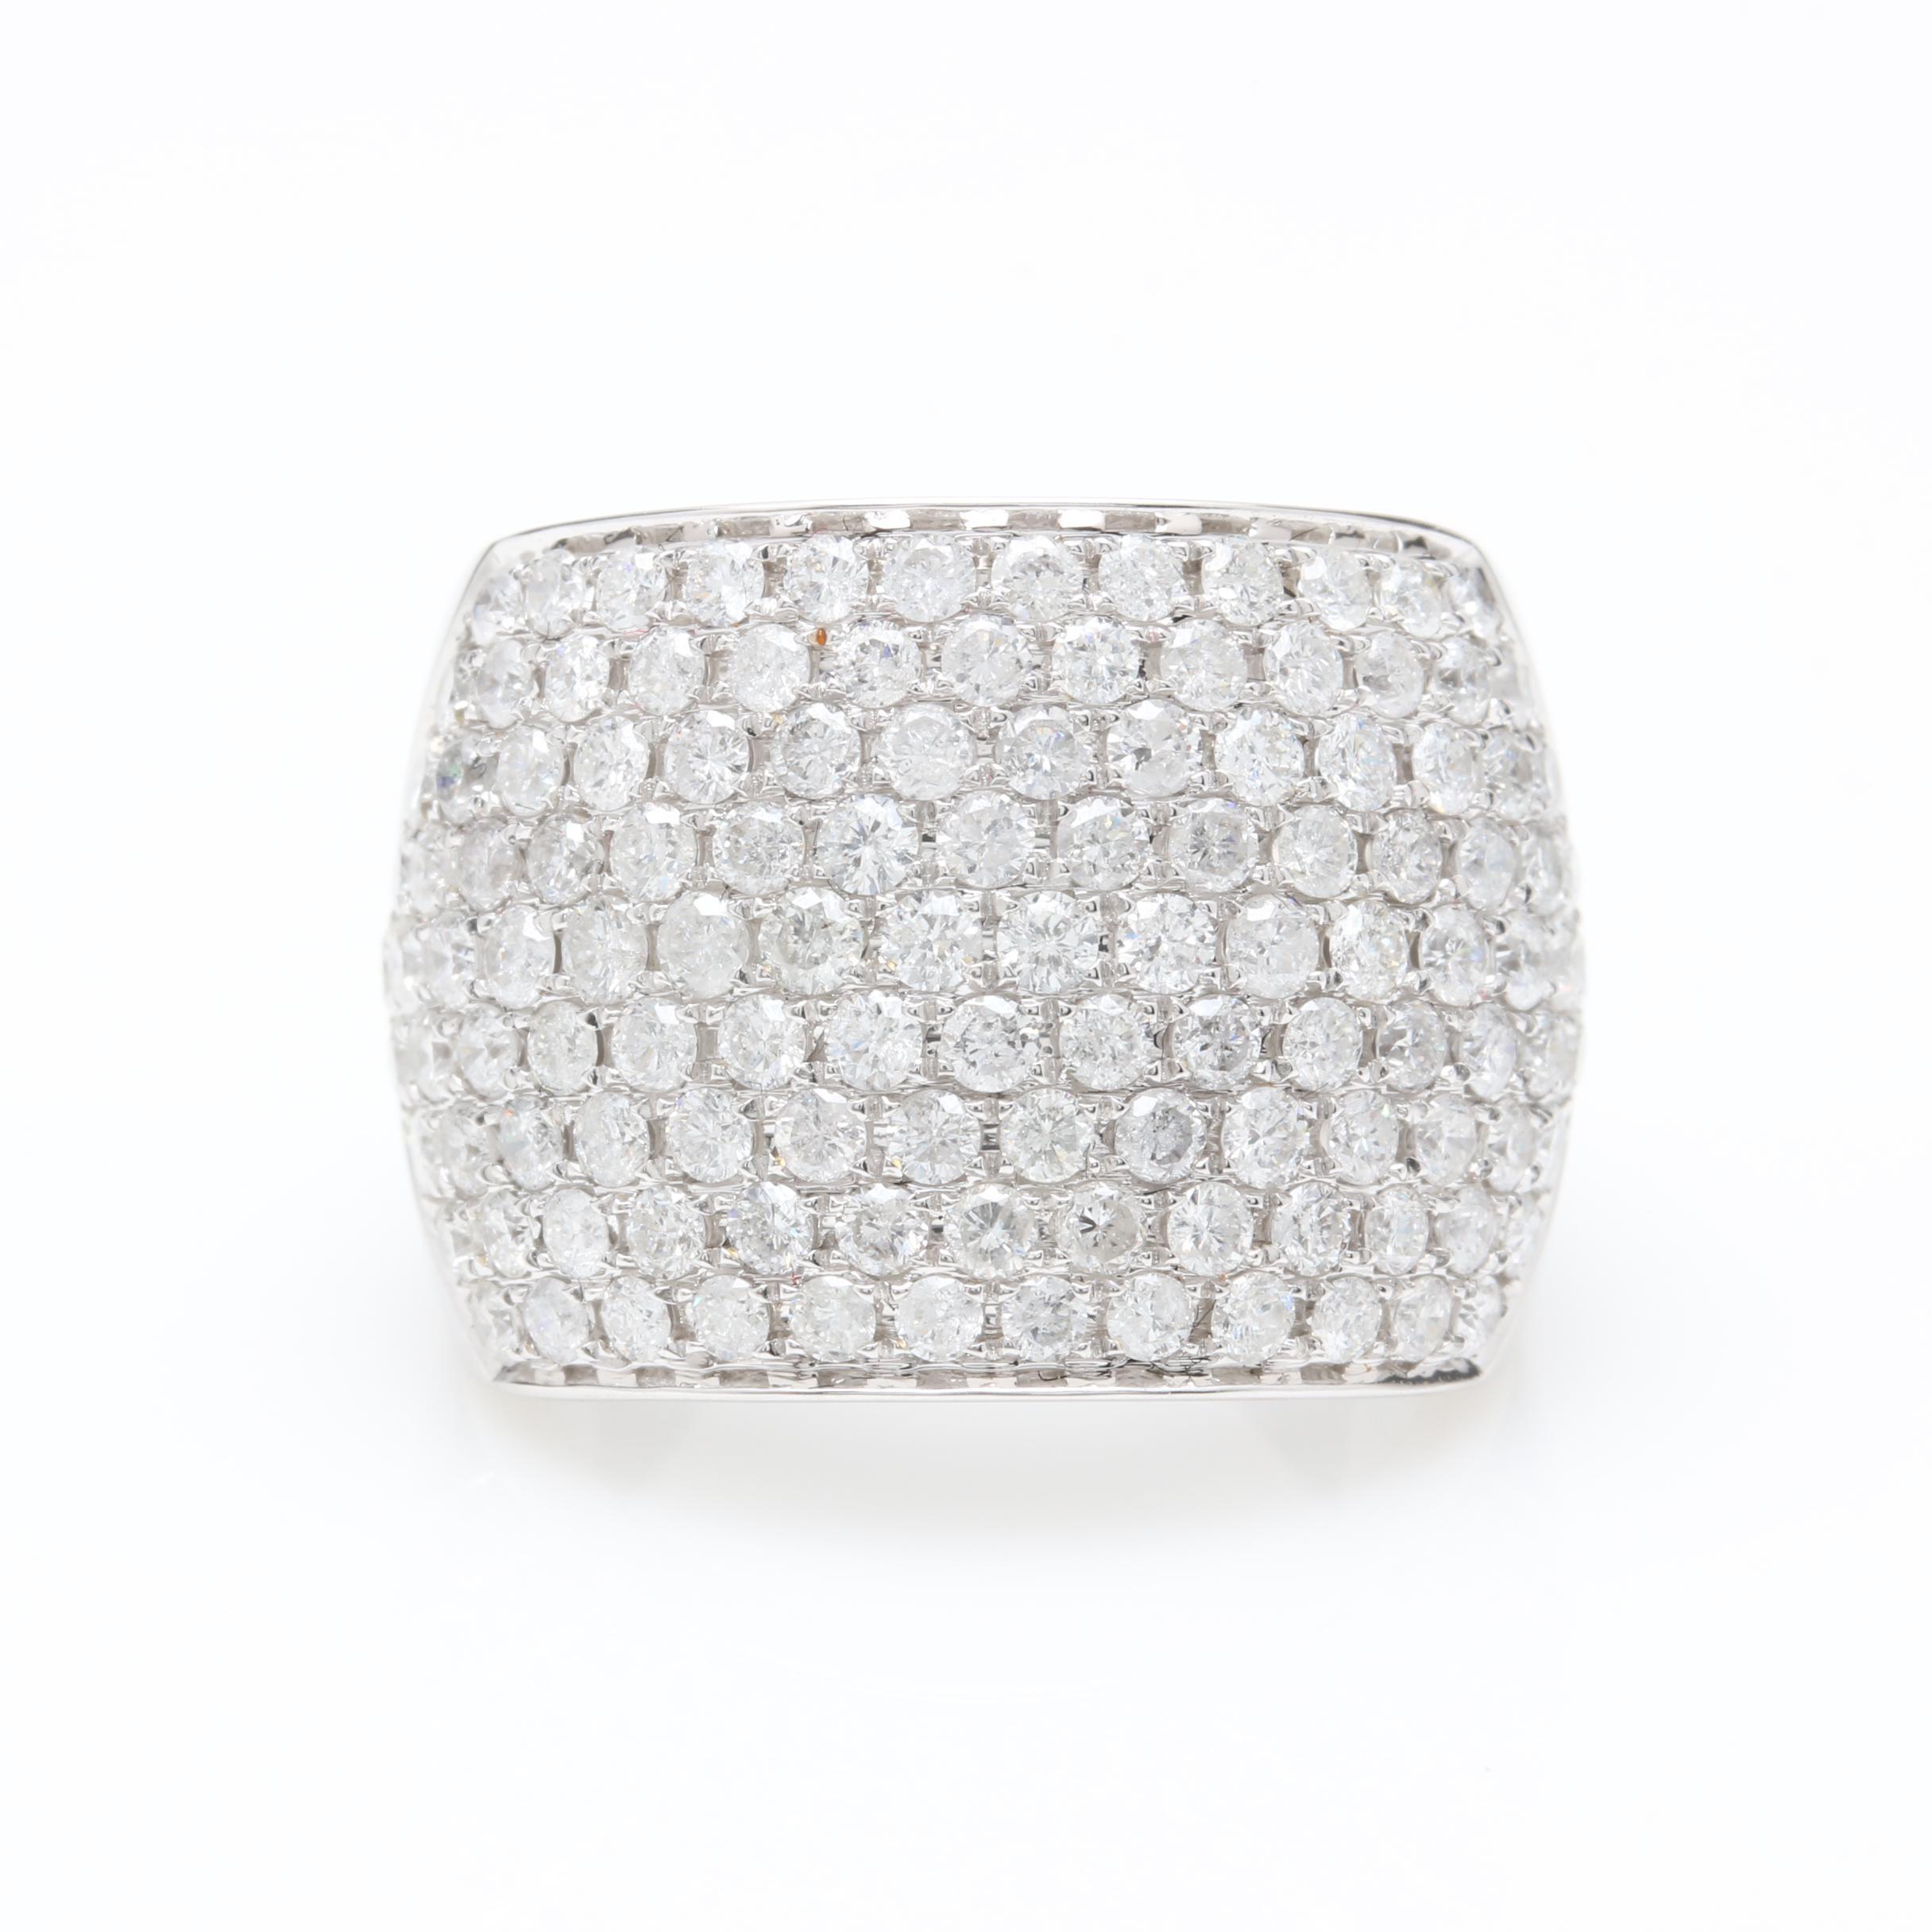 14K White Gold 3.52 CTW Diamond Ring